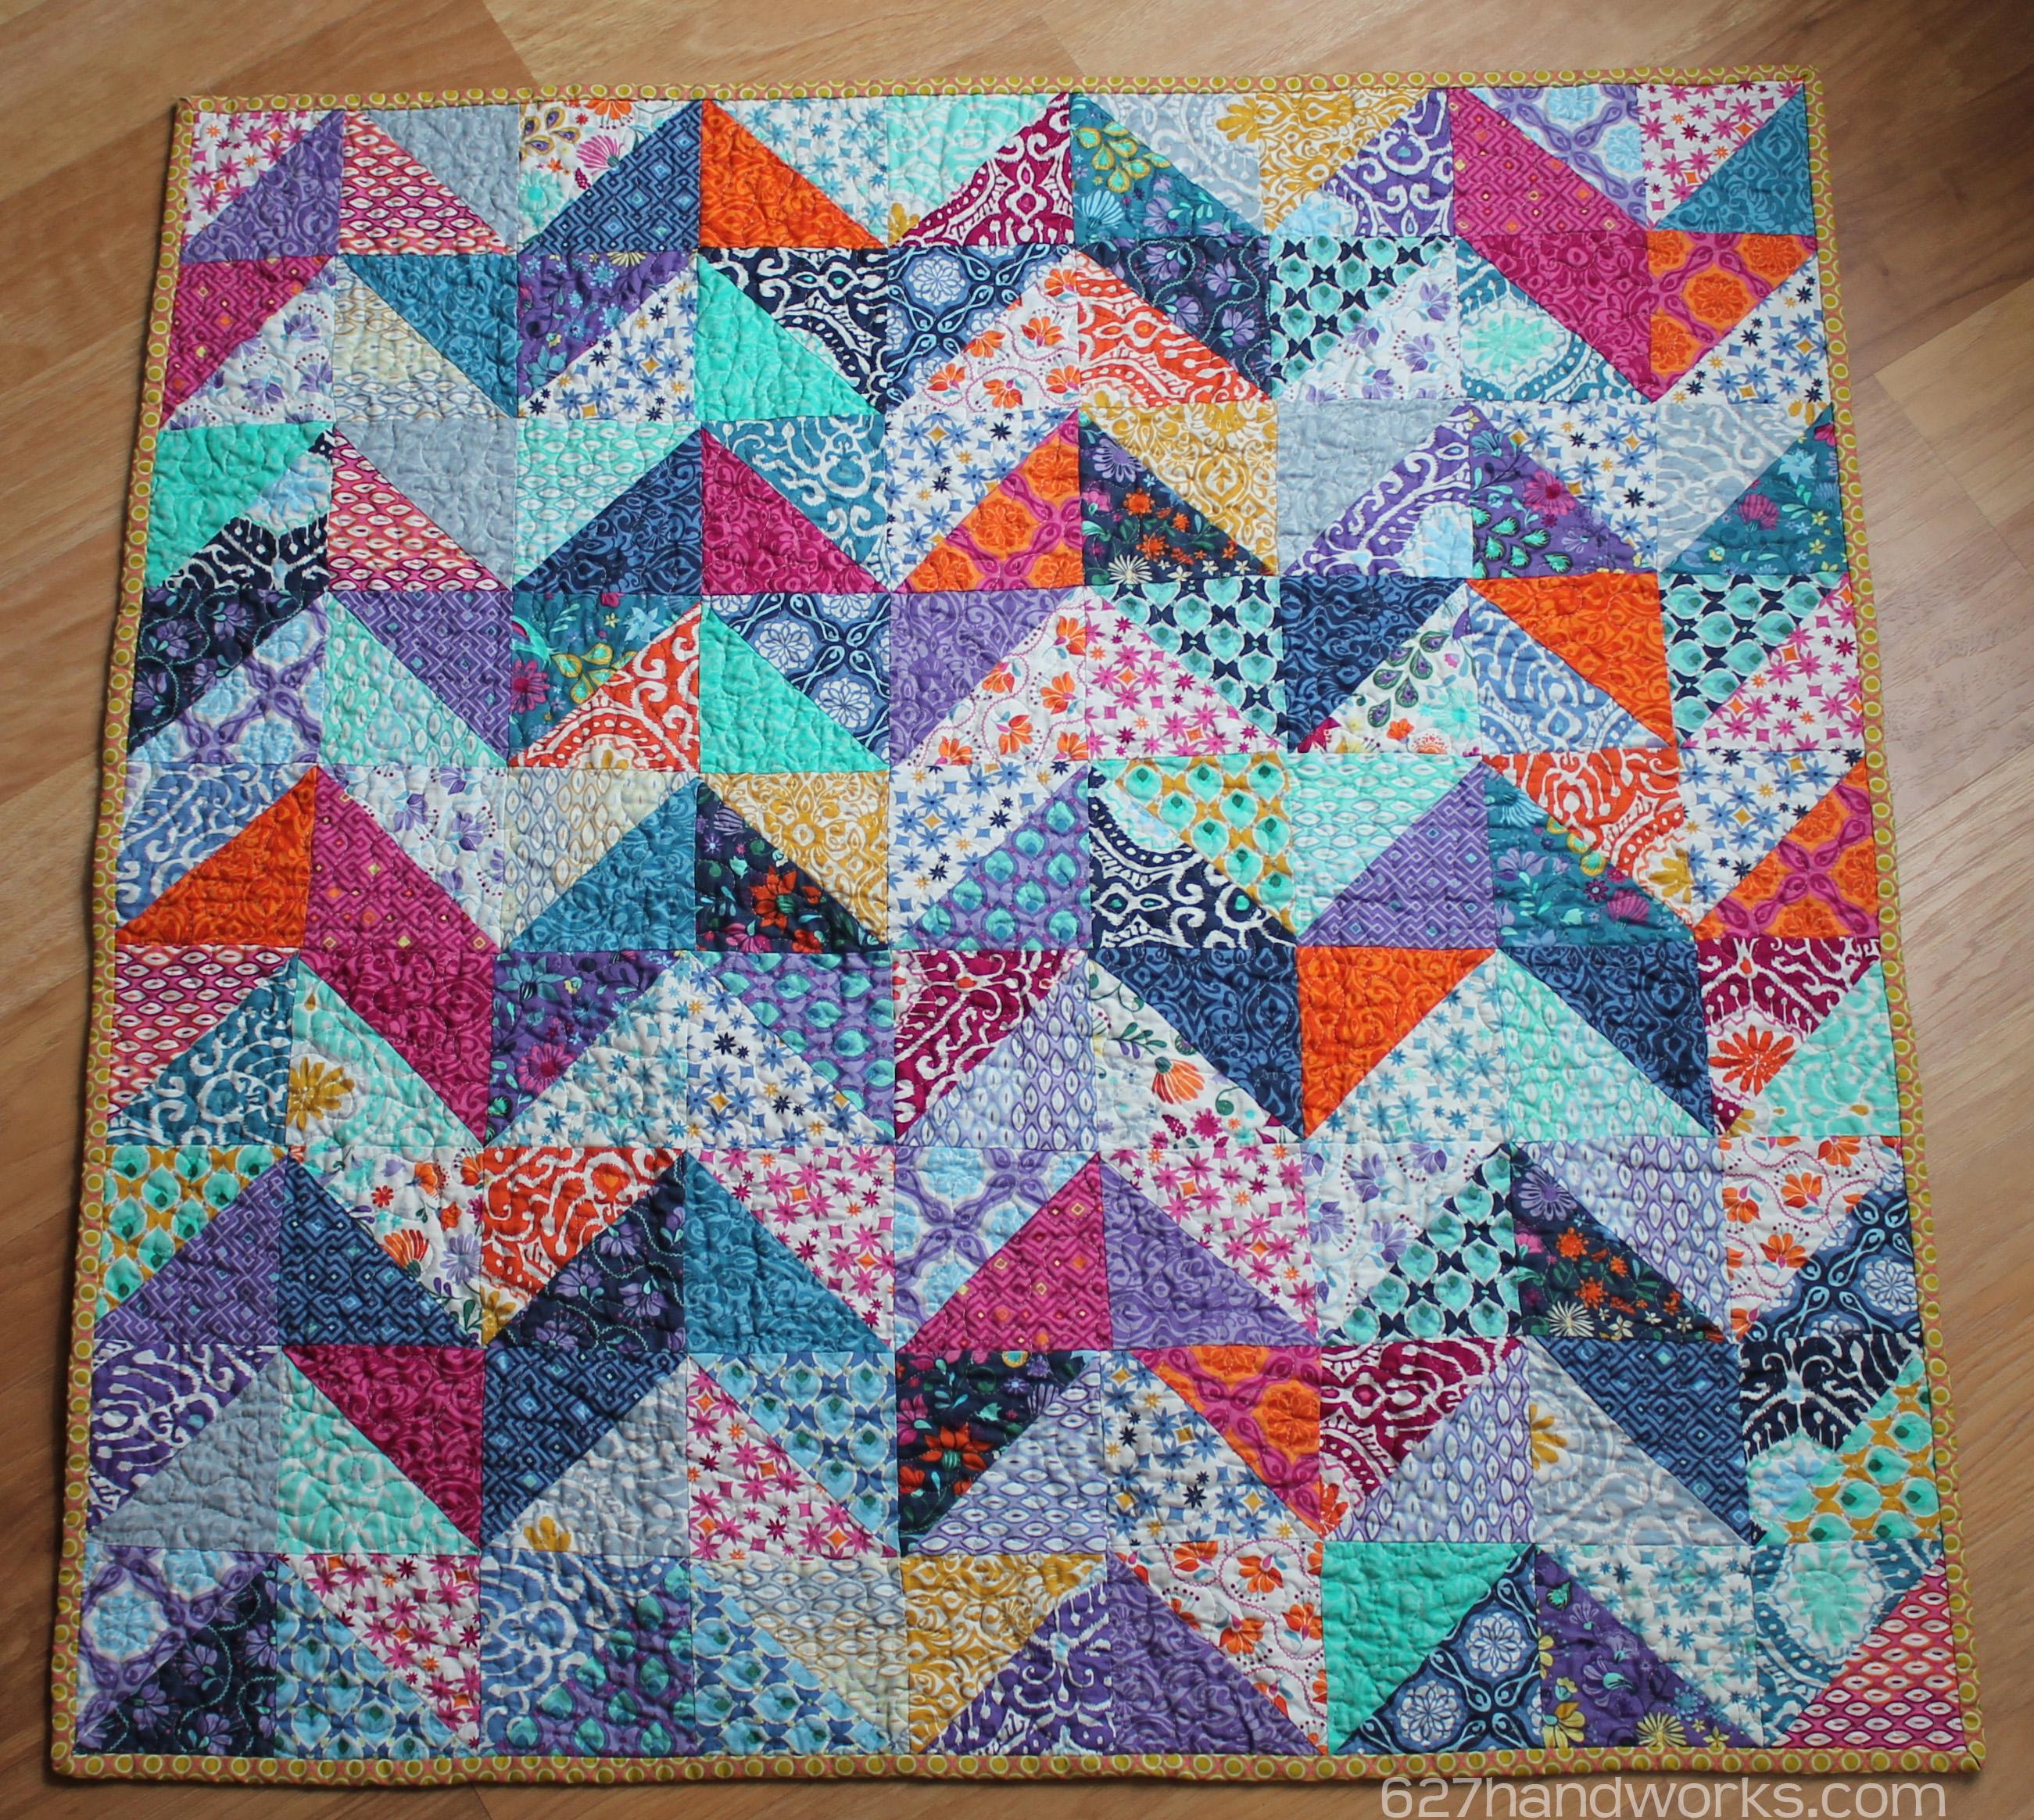 Patchwork Zigzag Baby Quilt 627handworks